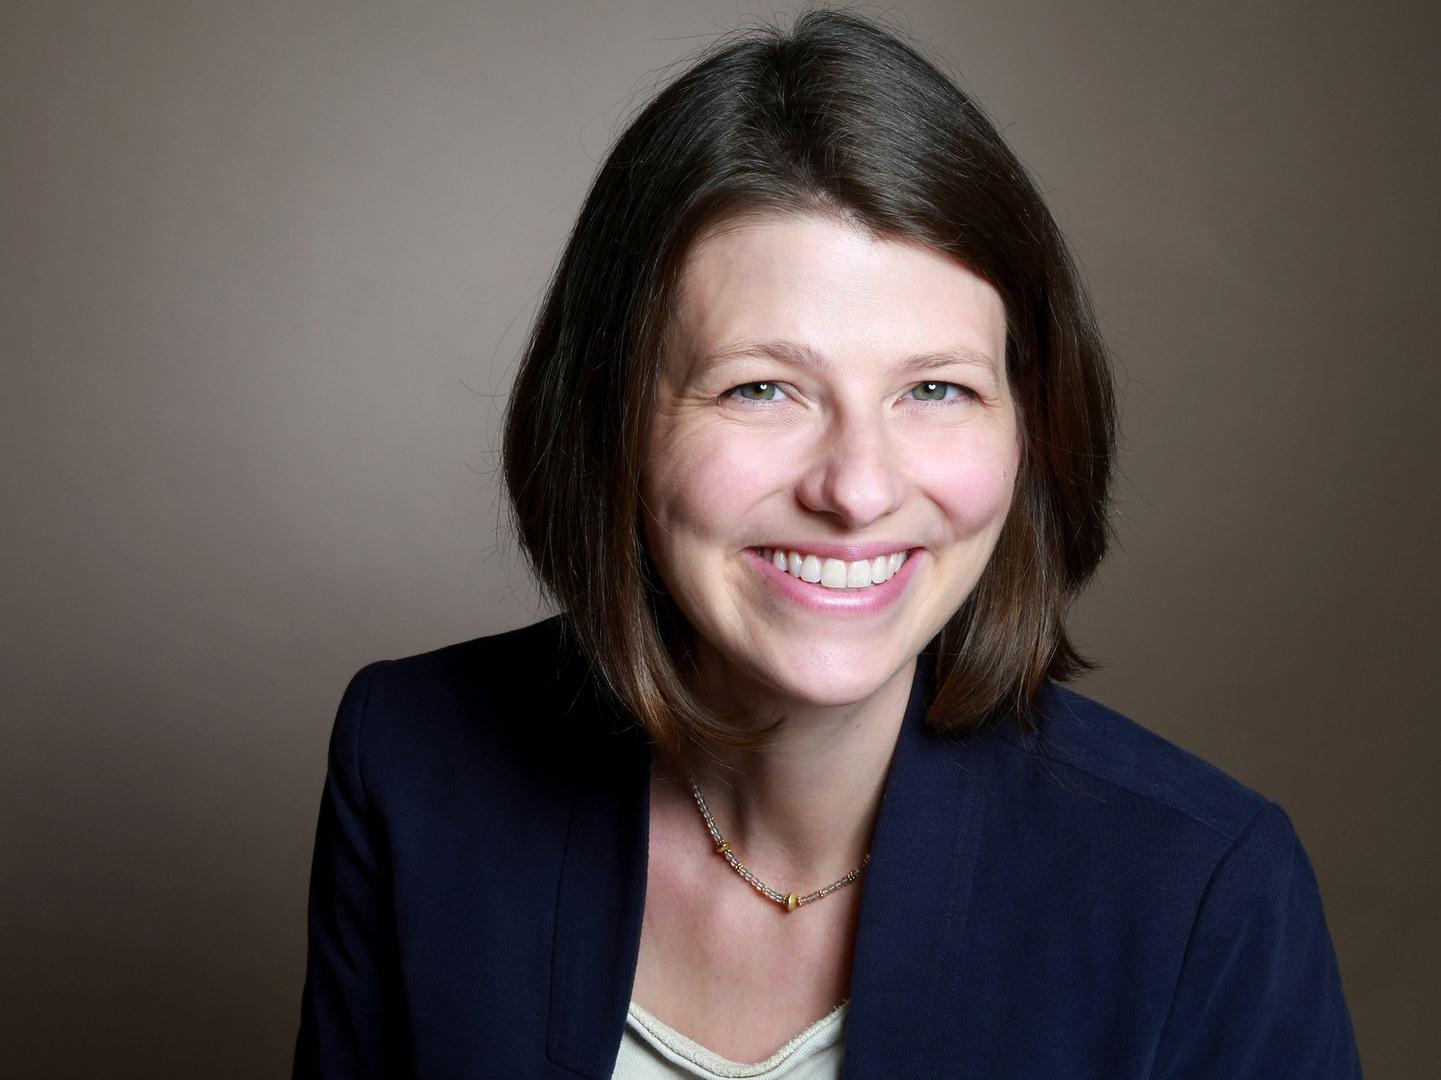 Dr. Hanna Christine Jacobs